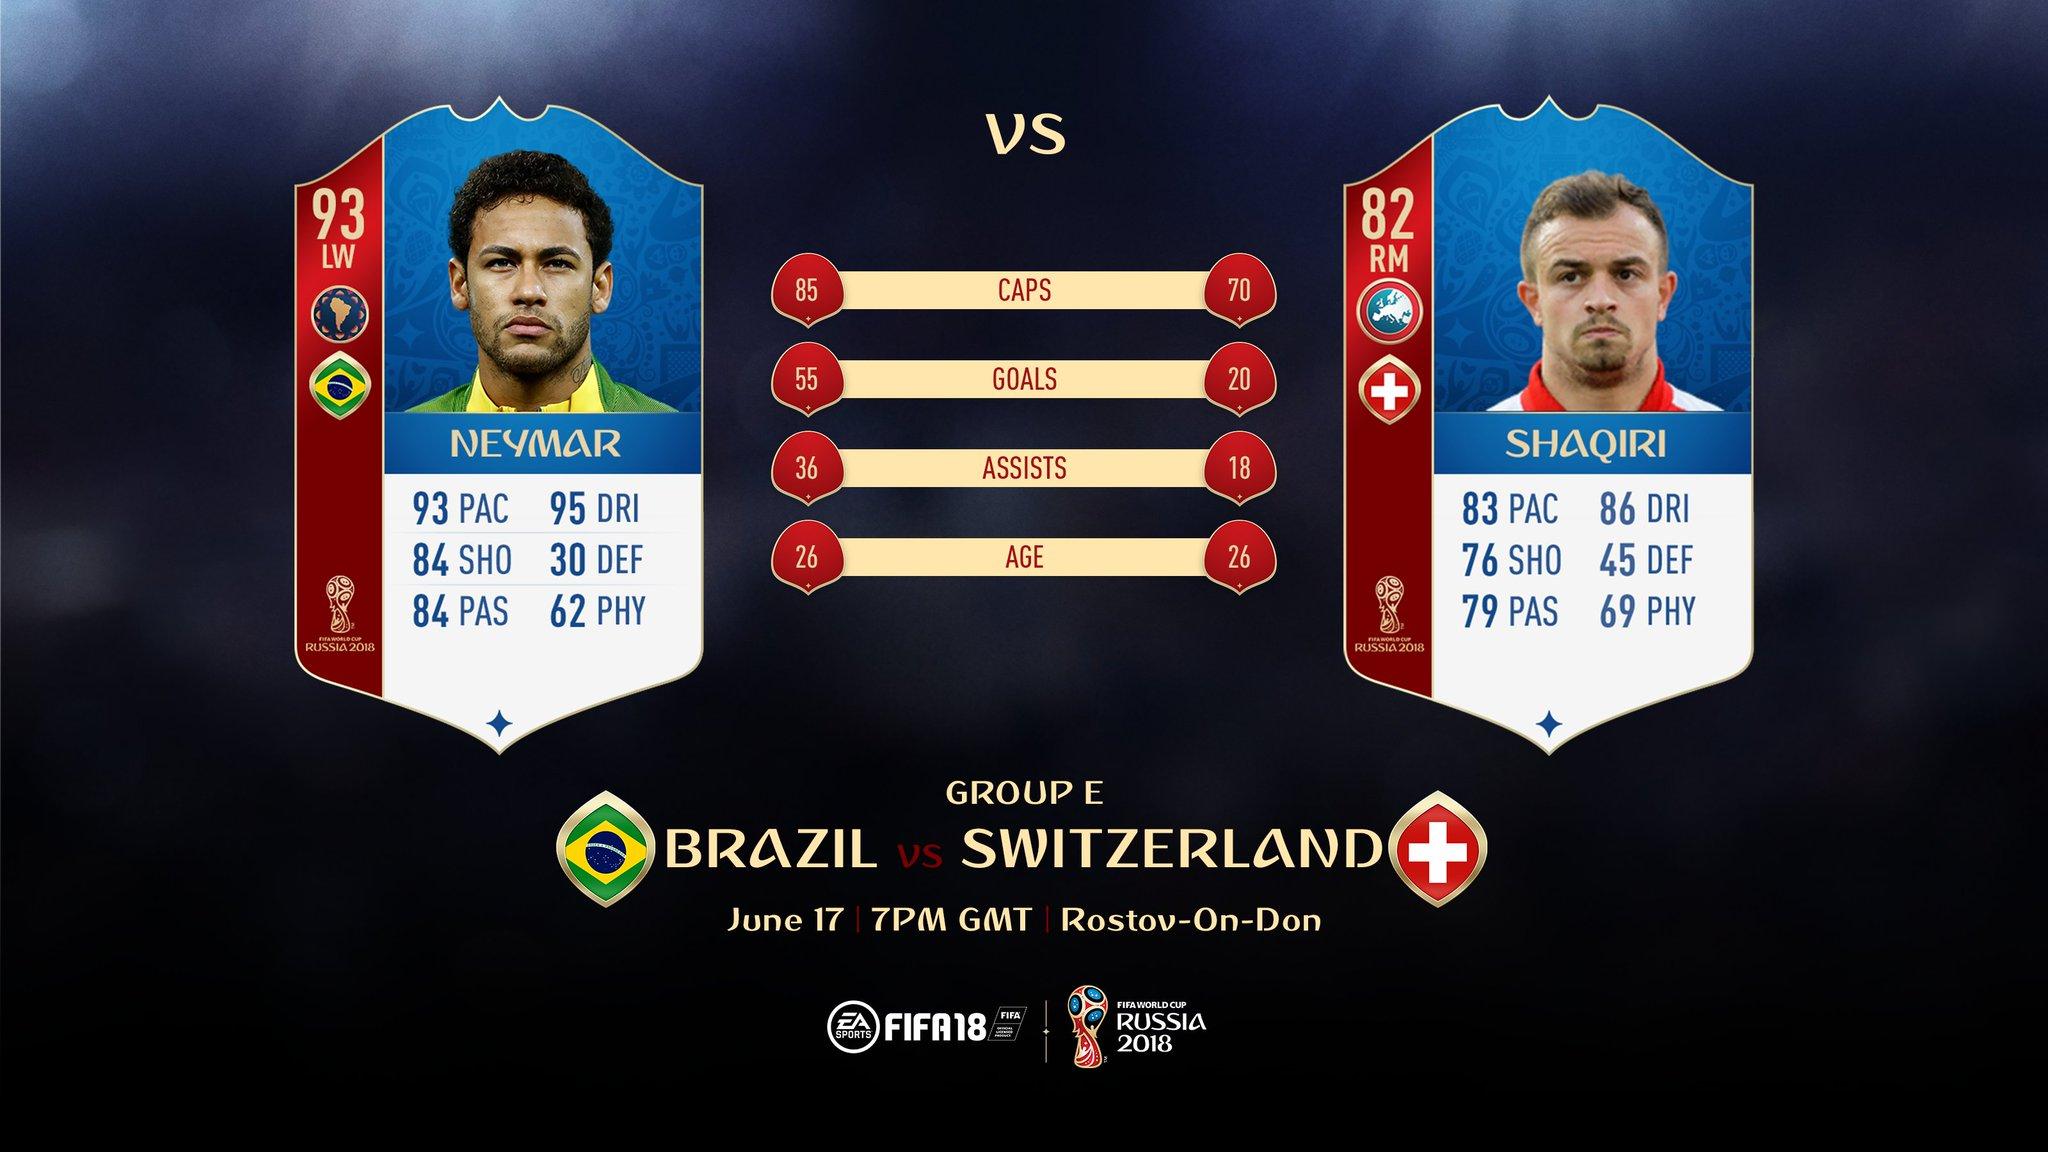 Score predictions? #BraSui #WorldCup https://t.co/22bx70I8vu